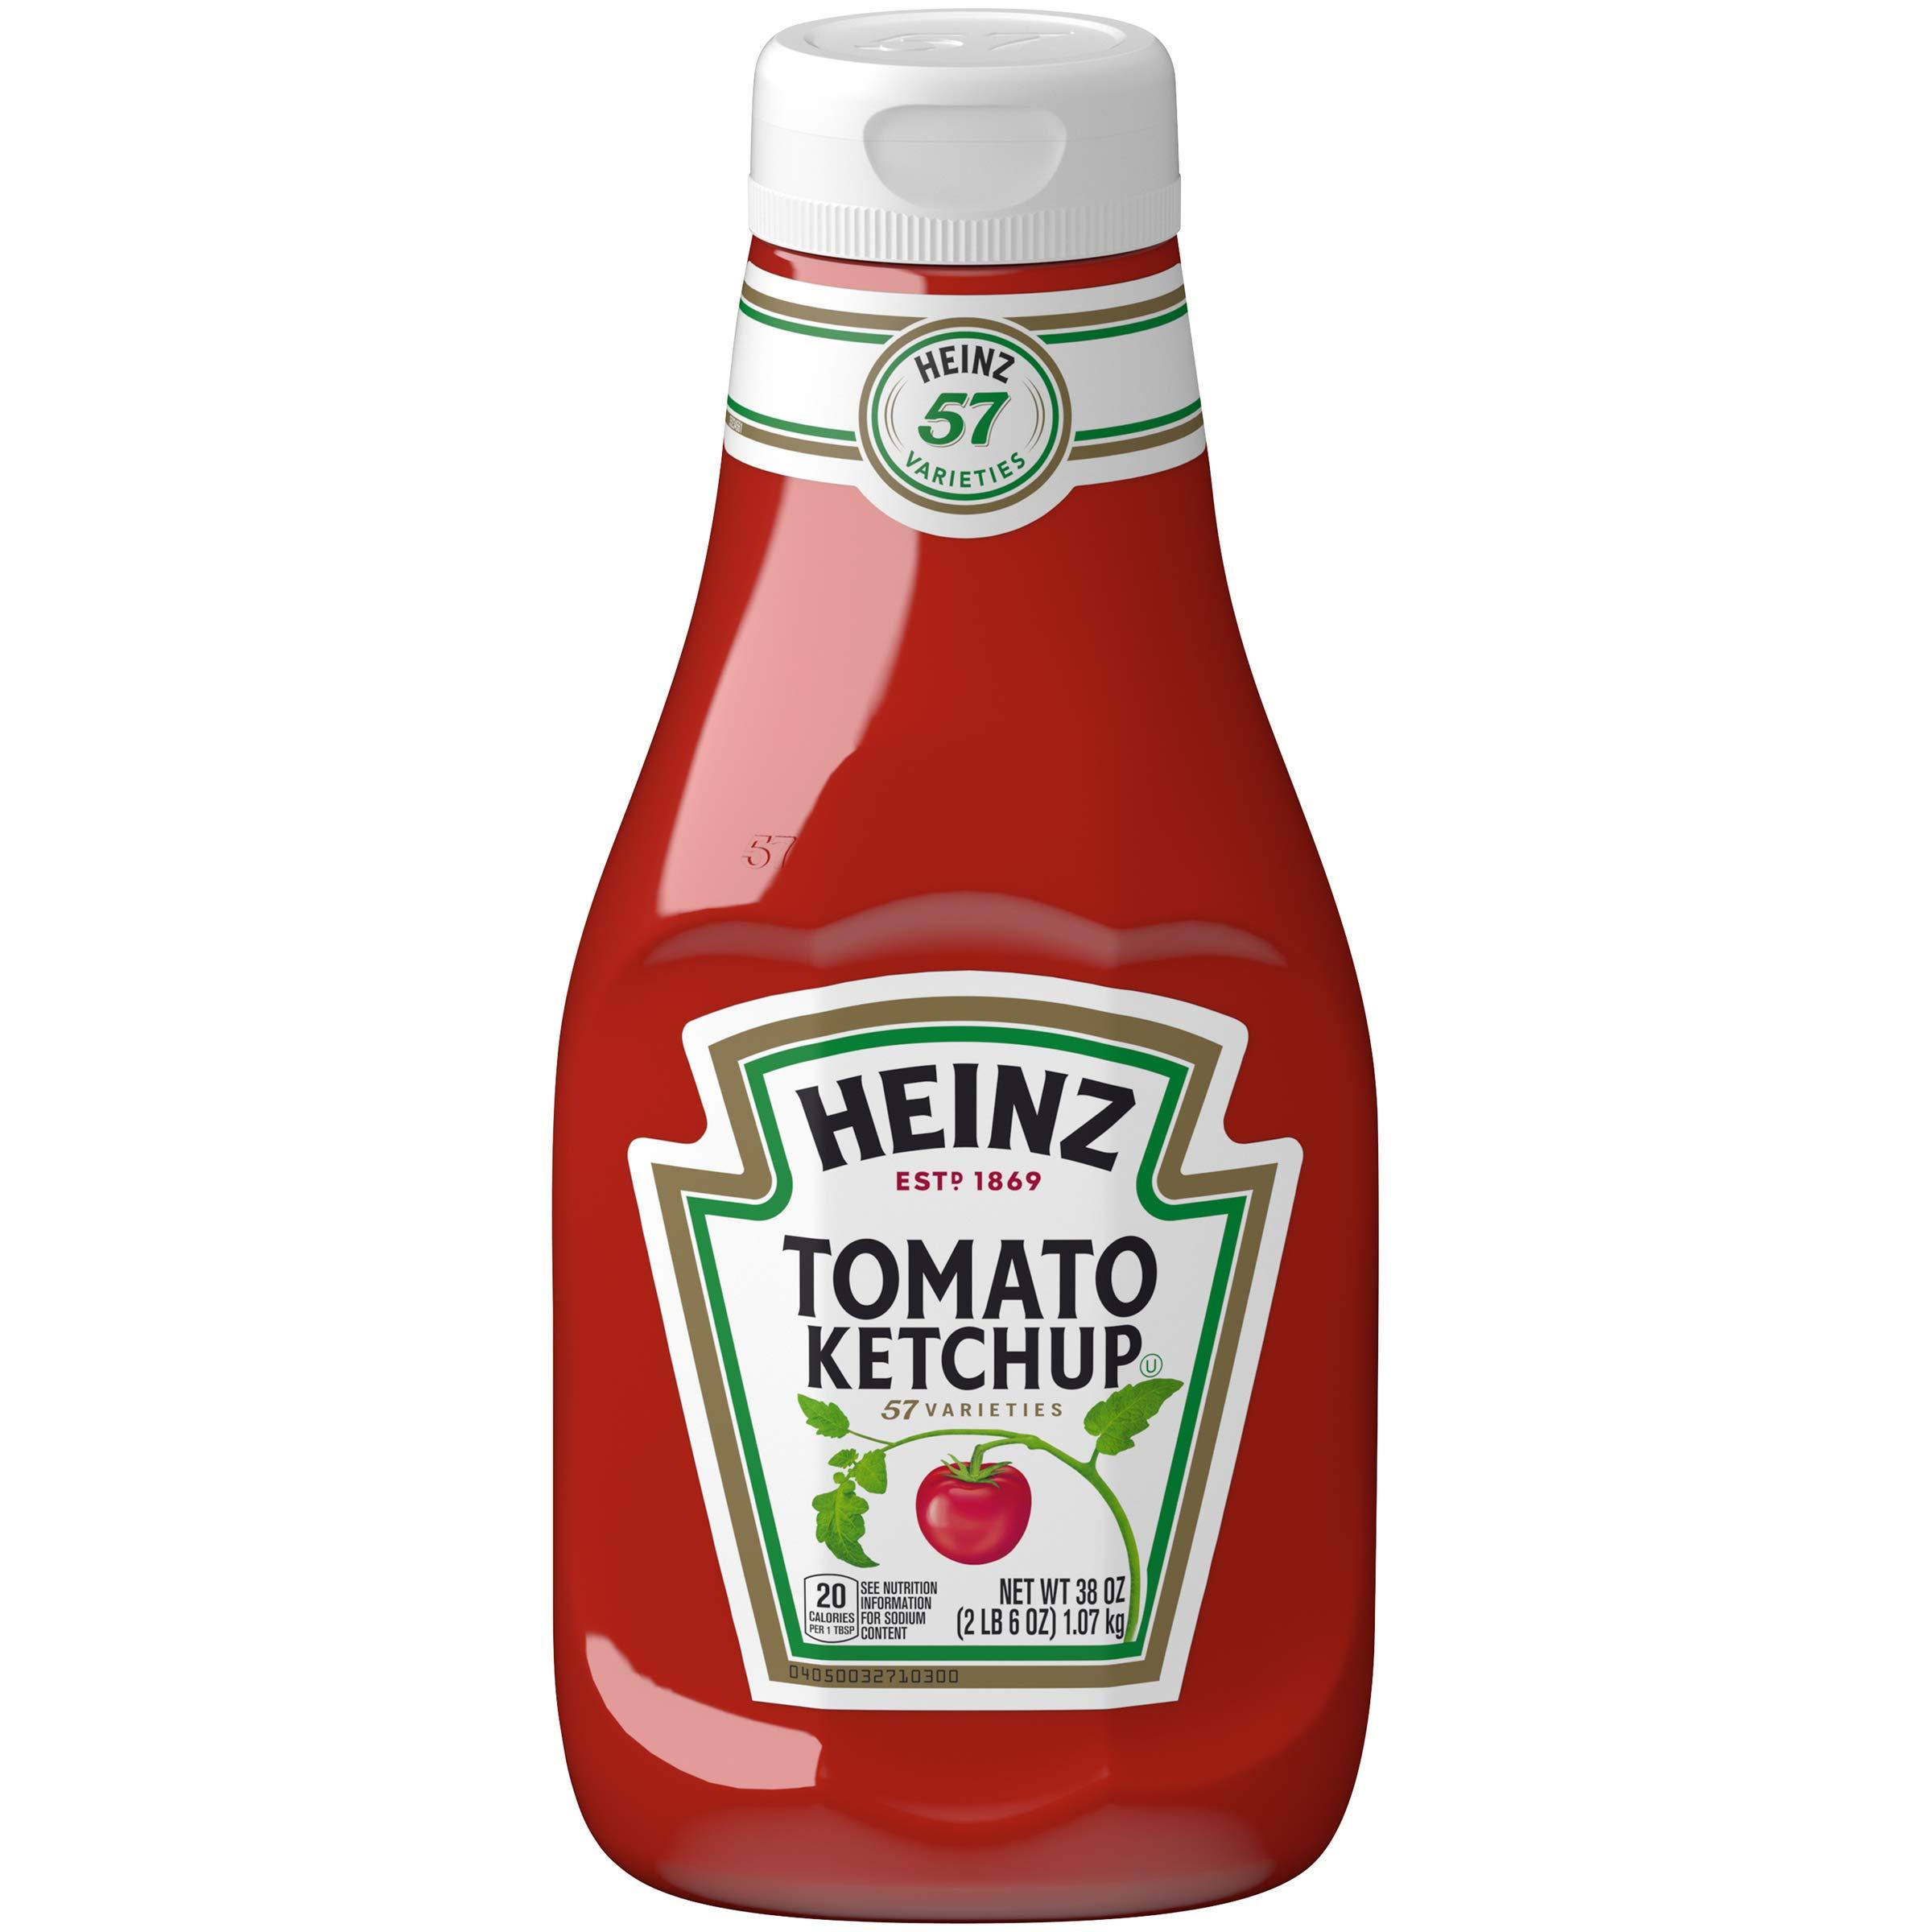 Heinz Bulk Tomato Ketchup (38 oz Bottles, Pack of 12) by Heinz